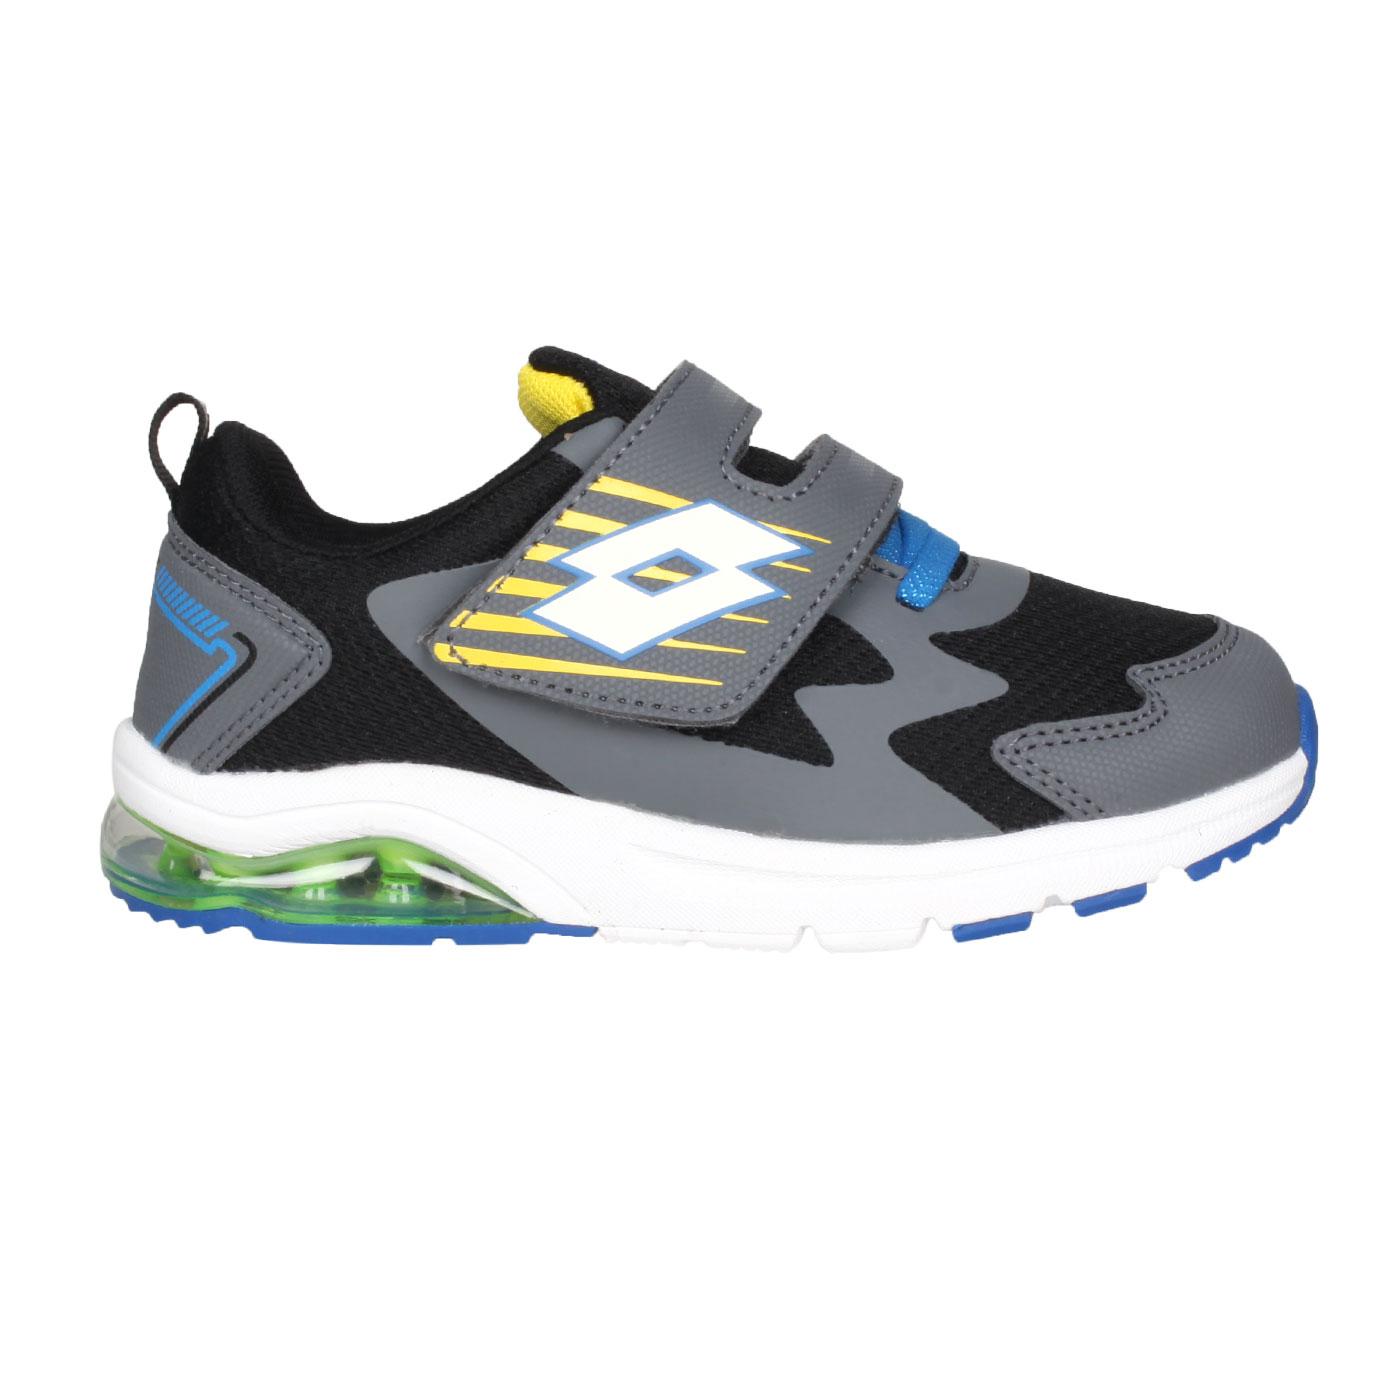 LOTTO 大童避震氣墊跑鞋 LT1AKR3770 - 黑灰藍